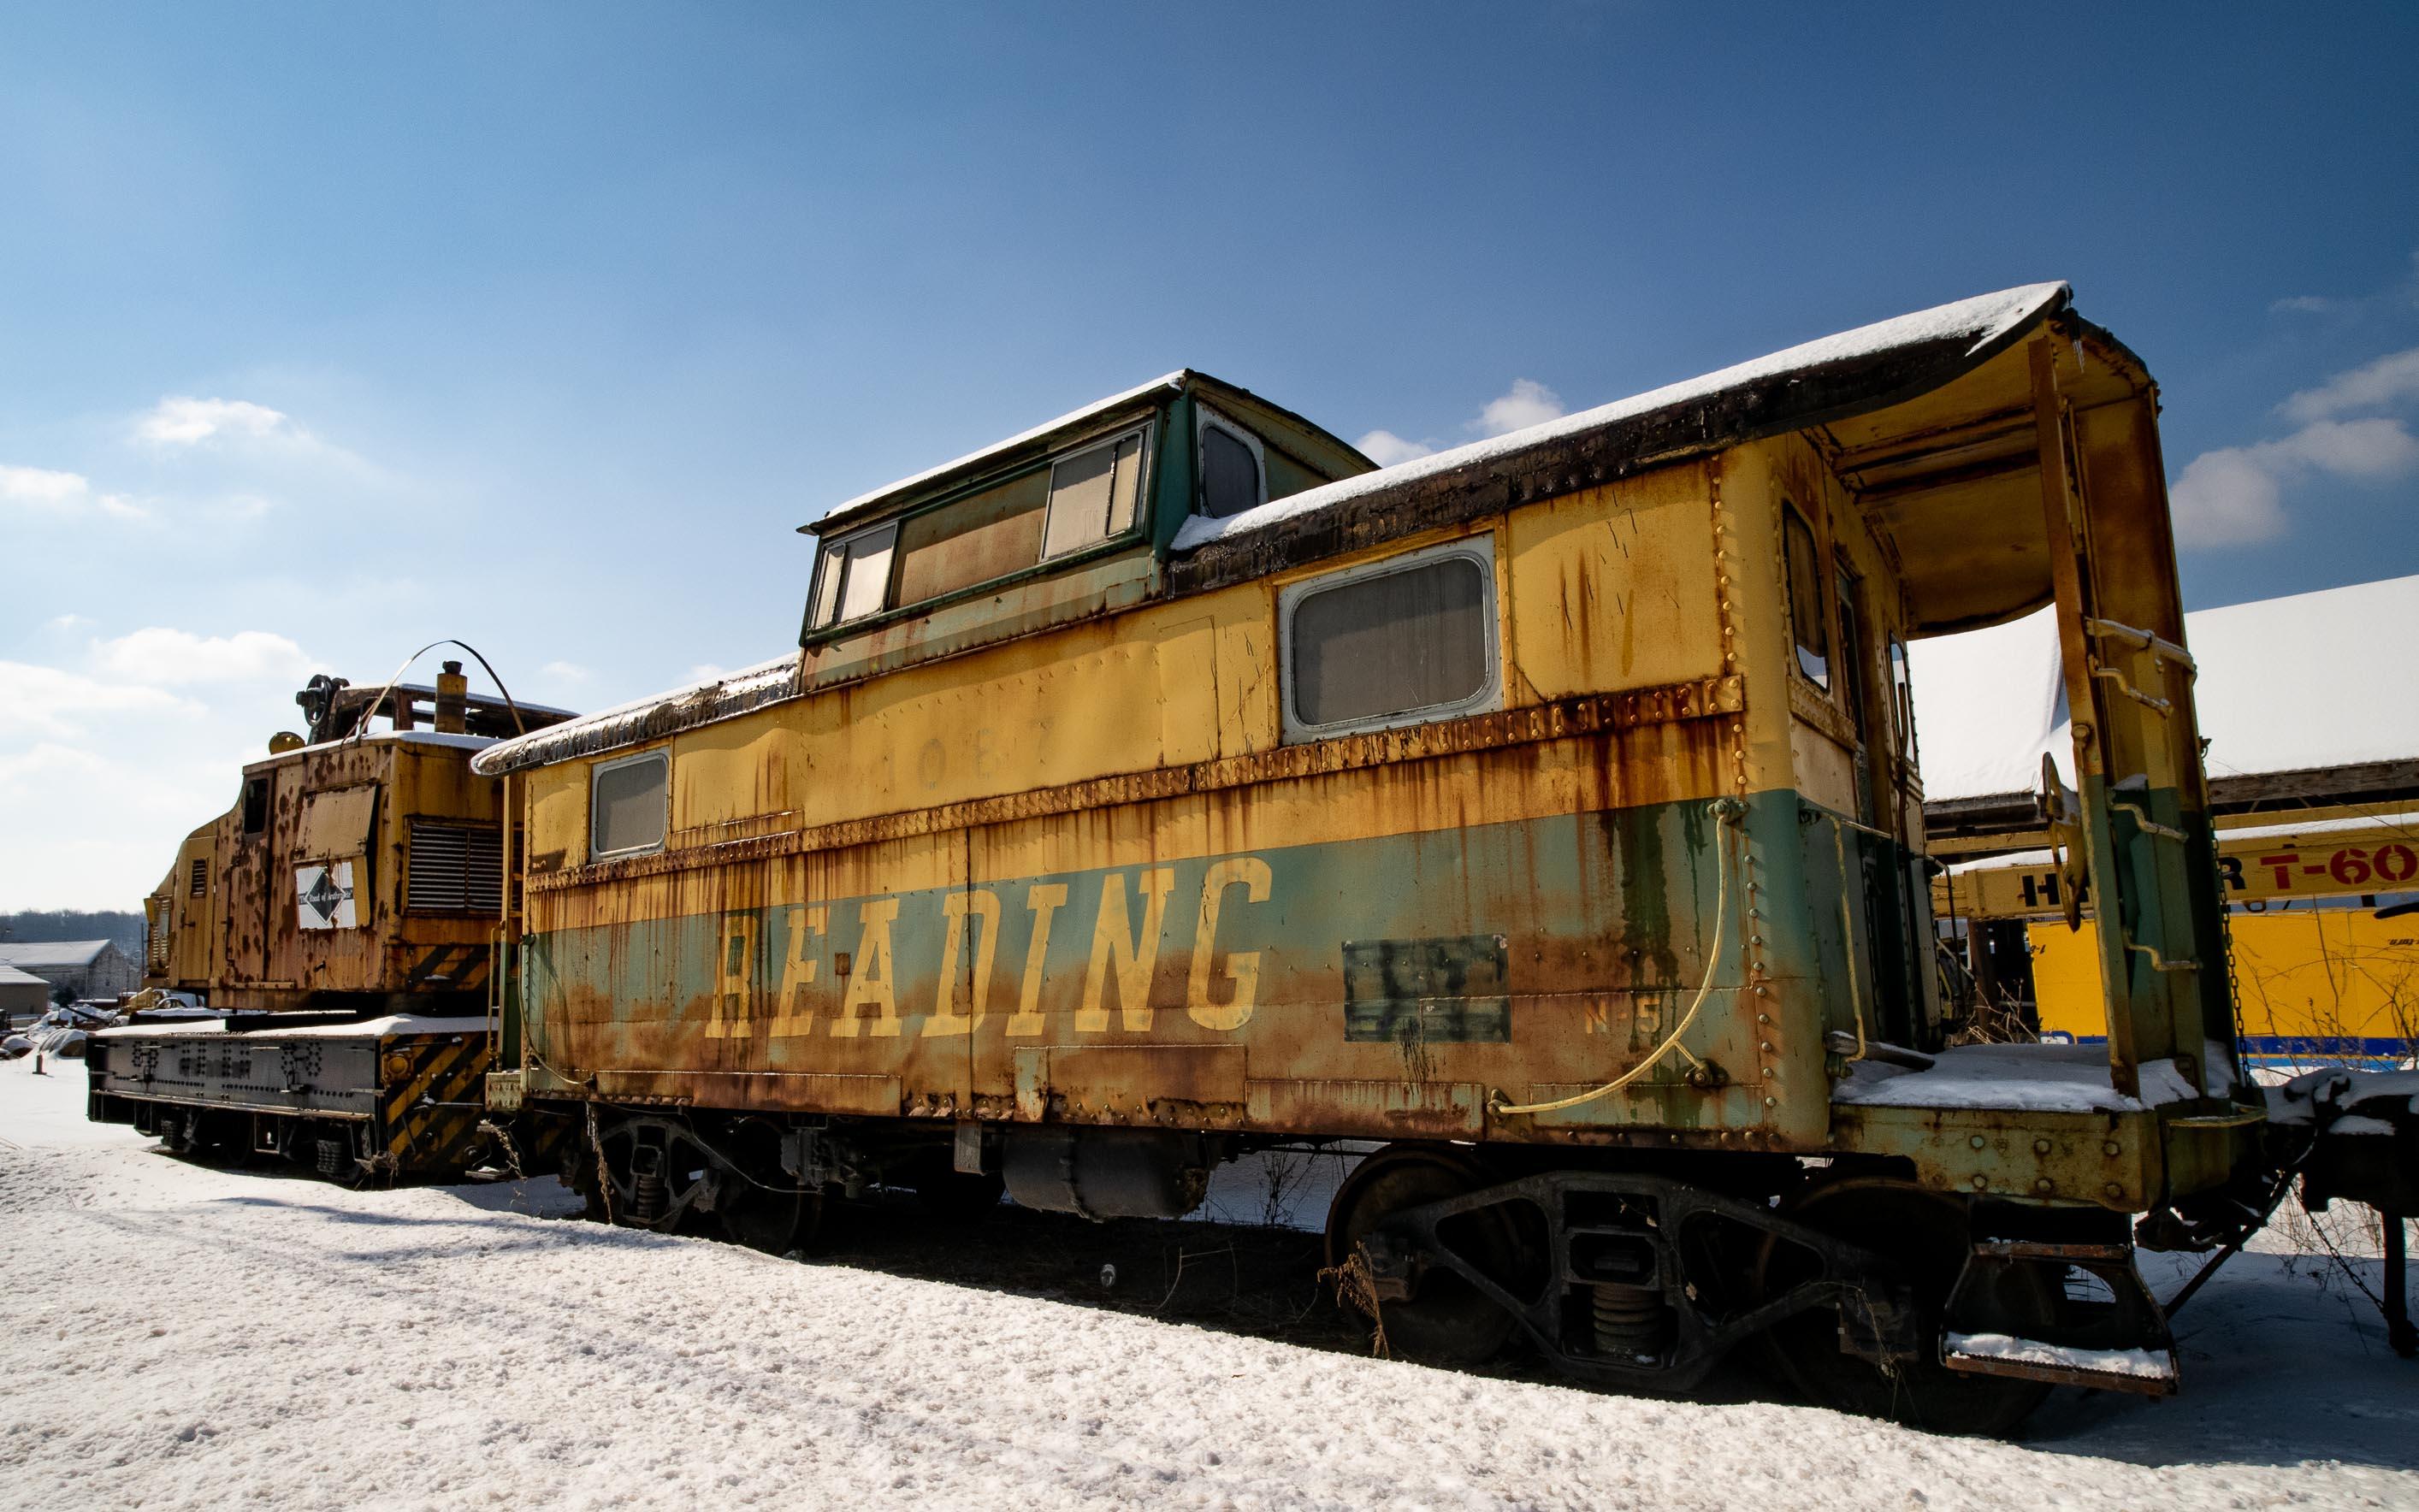 An old Reading Railroad train car.